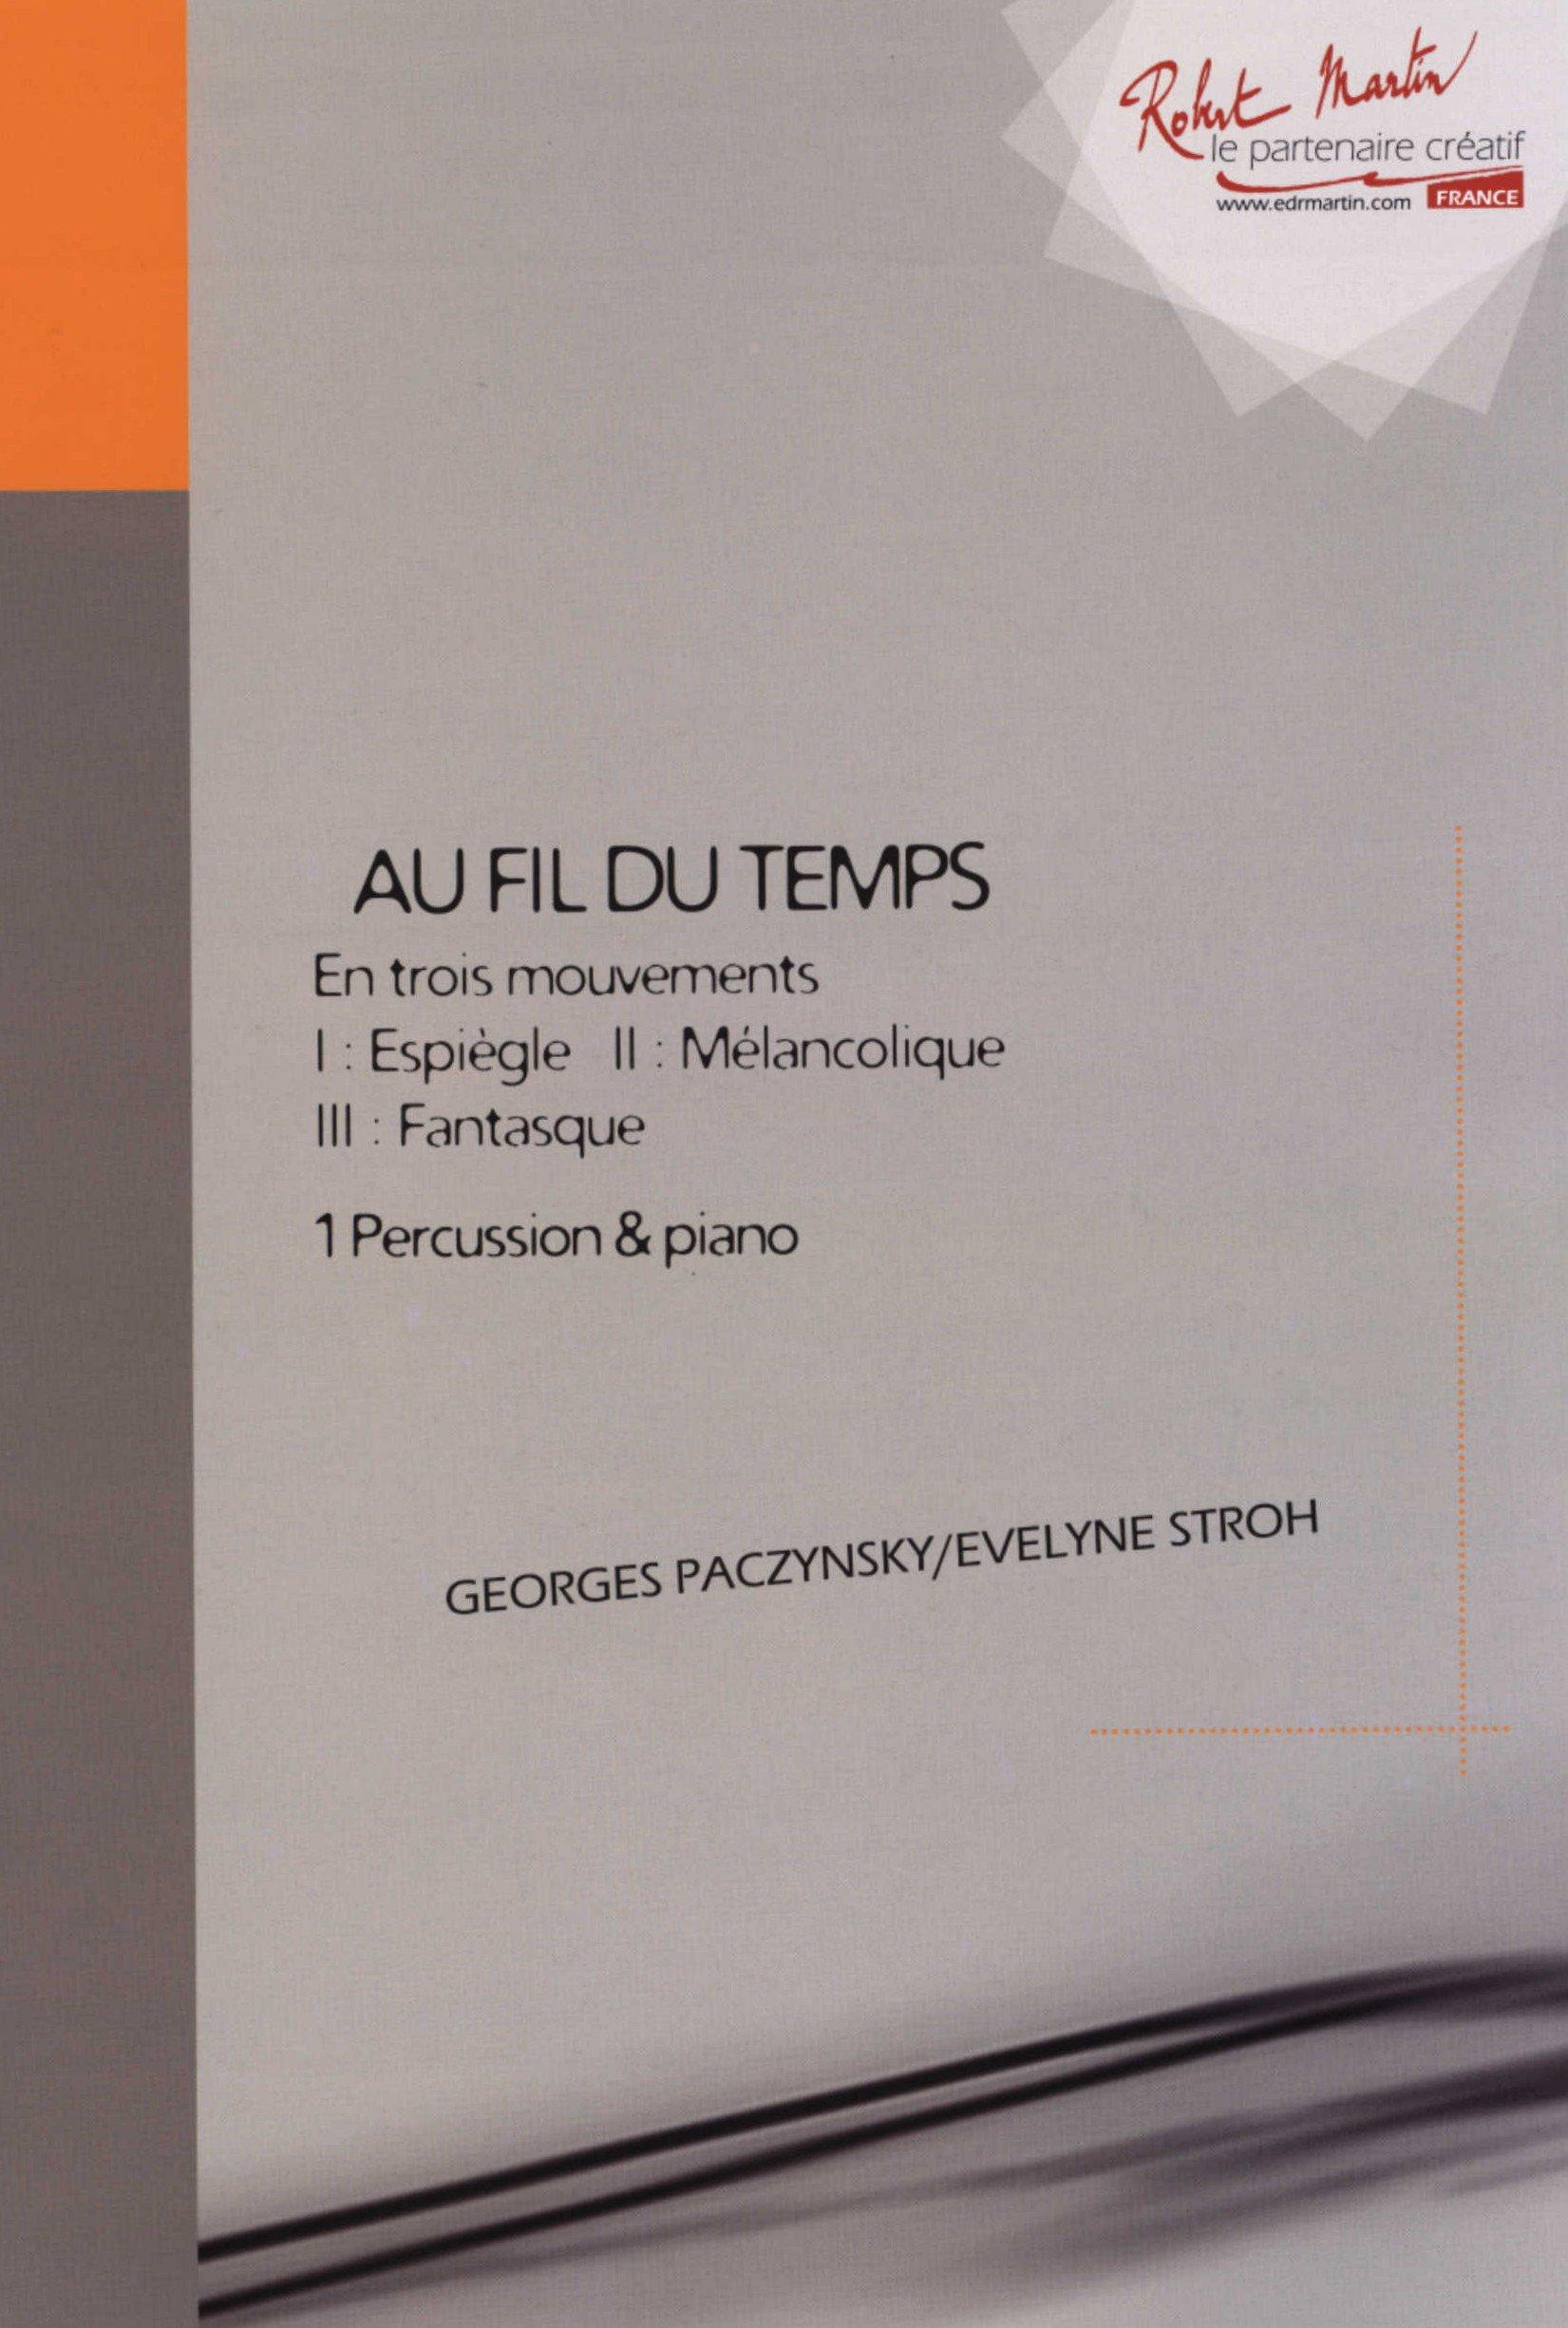 Au fil du temps Broché – 1 juillet 2011 Georges Paczynsky Evelyne Stroh Editions Robert Martin 0231073445